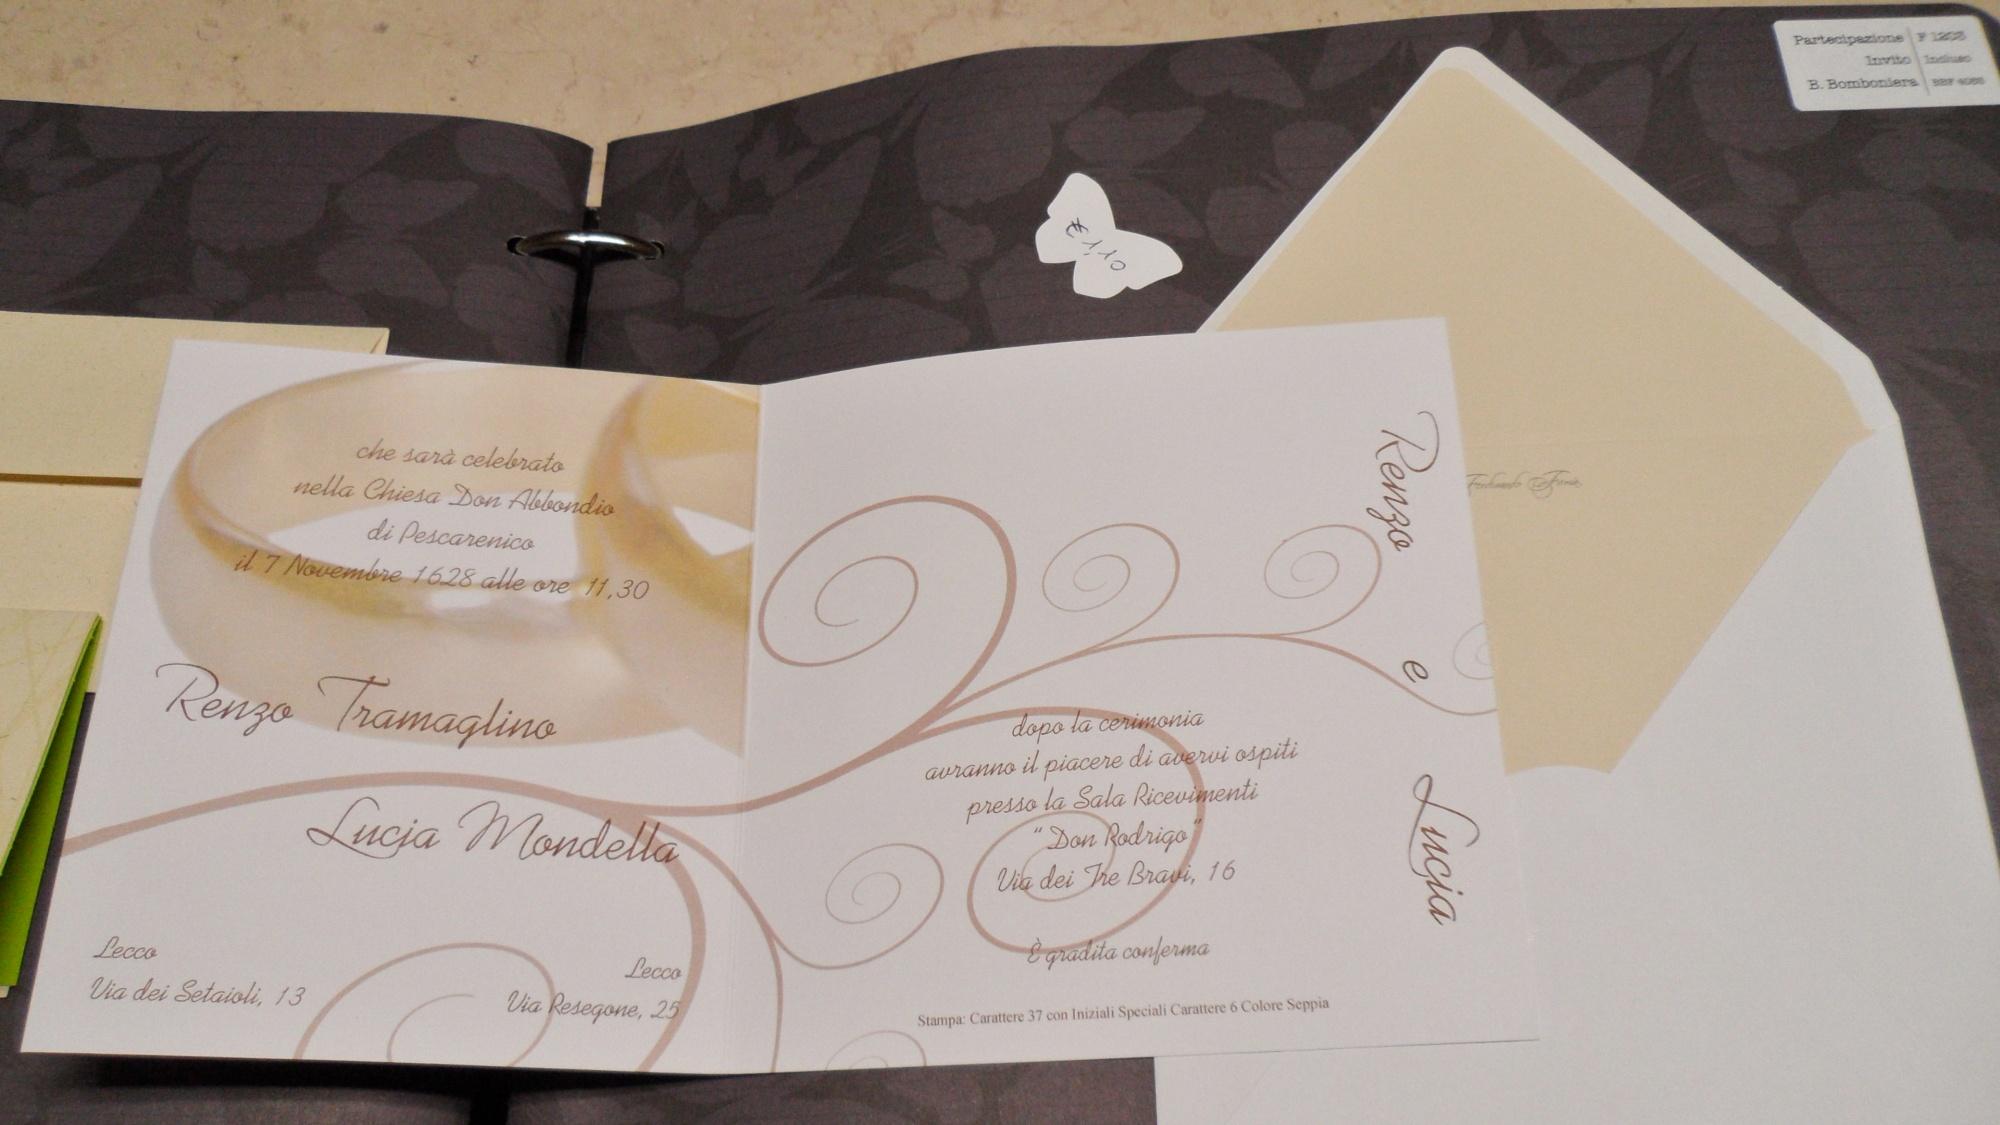 Costo Partecipazioni Matrimonio 2018.Partecipazioni Nozze 2018 Originali Eleganti Spiritose